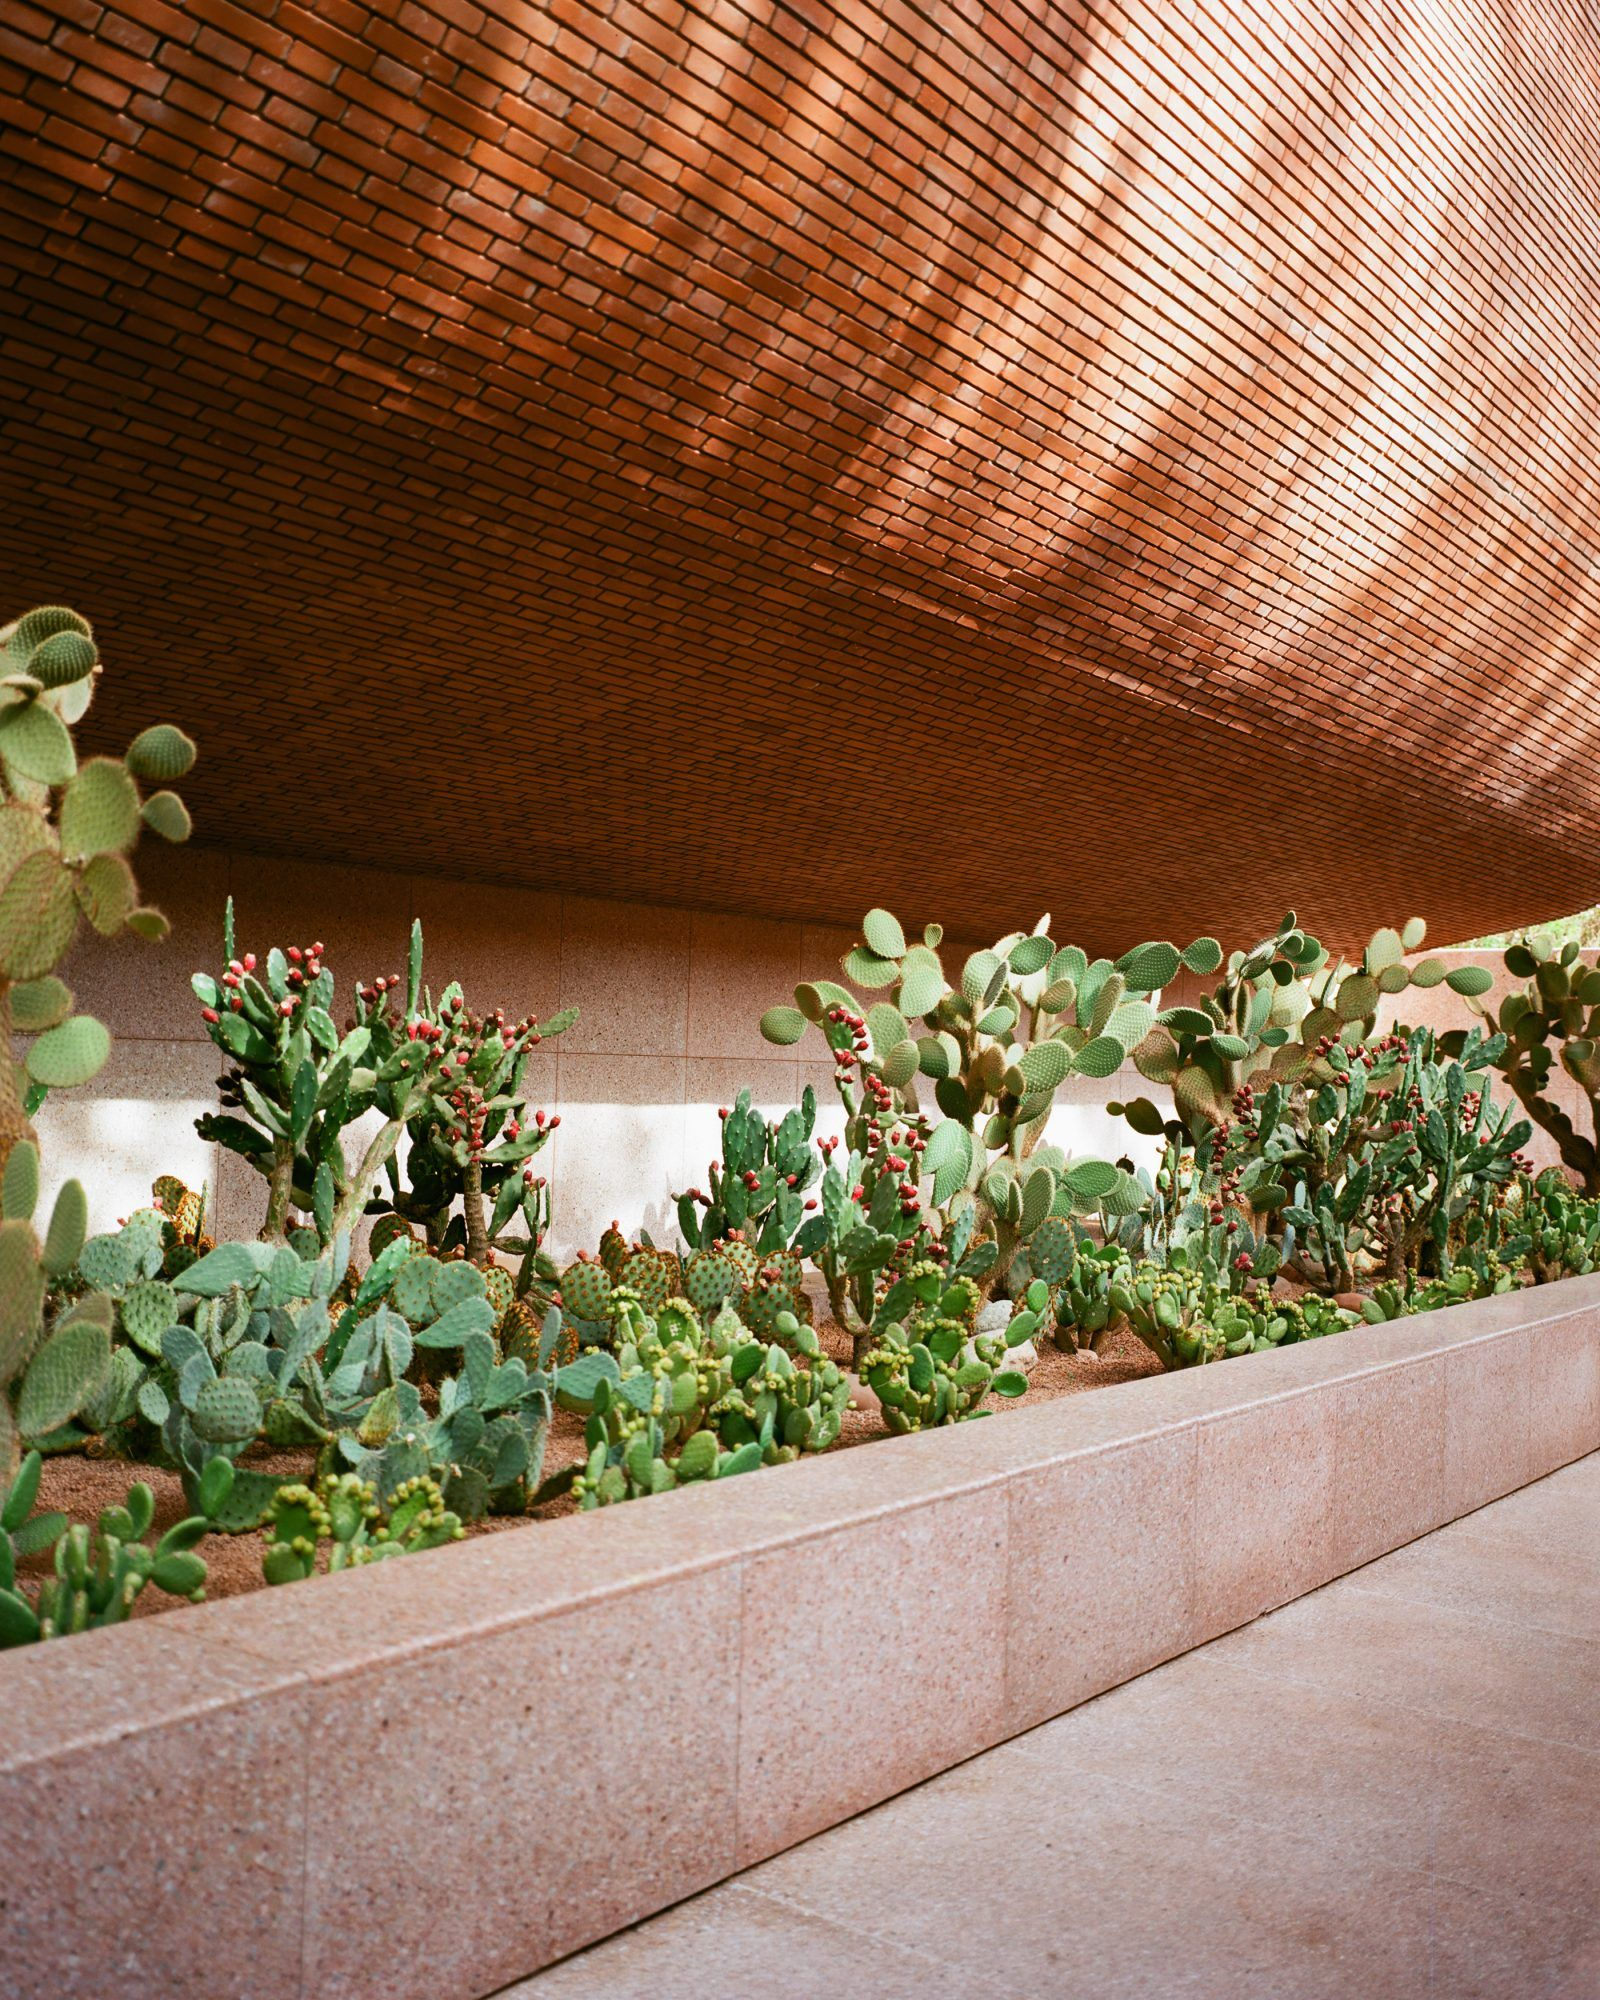 Yves Saint Laurent in Marrakech – Aperçu | Wanderlust | Pinterest